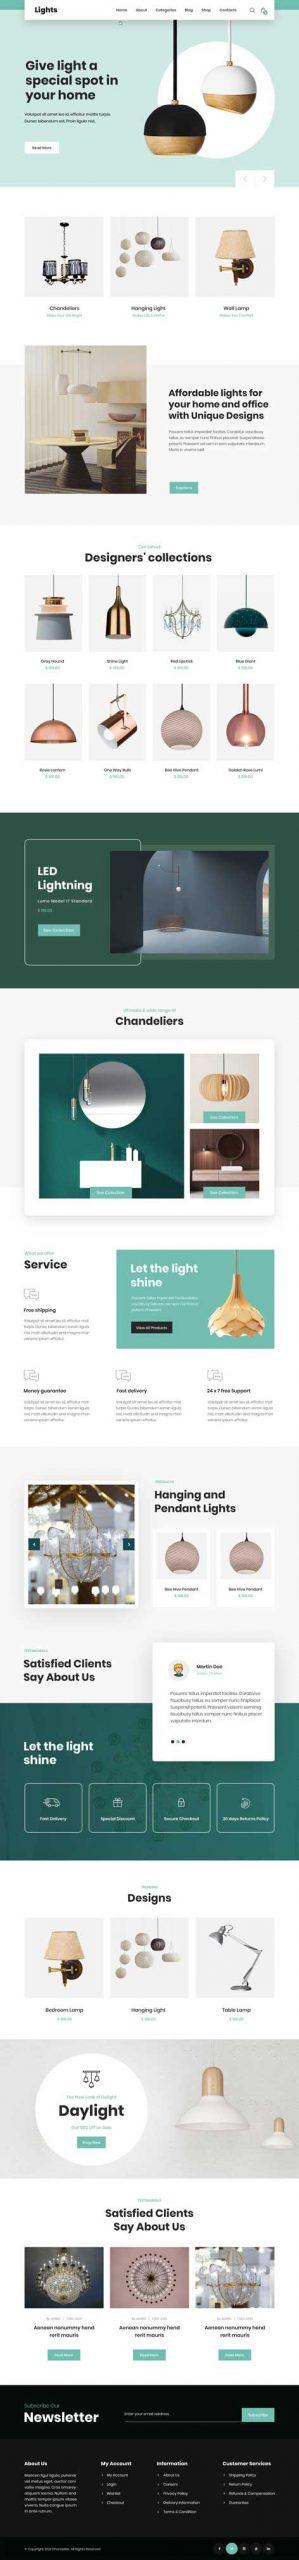 lighting service WordPress theme